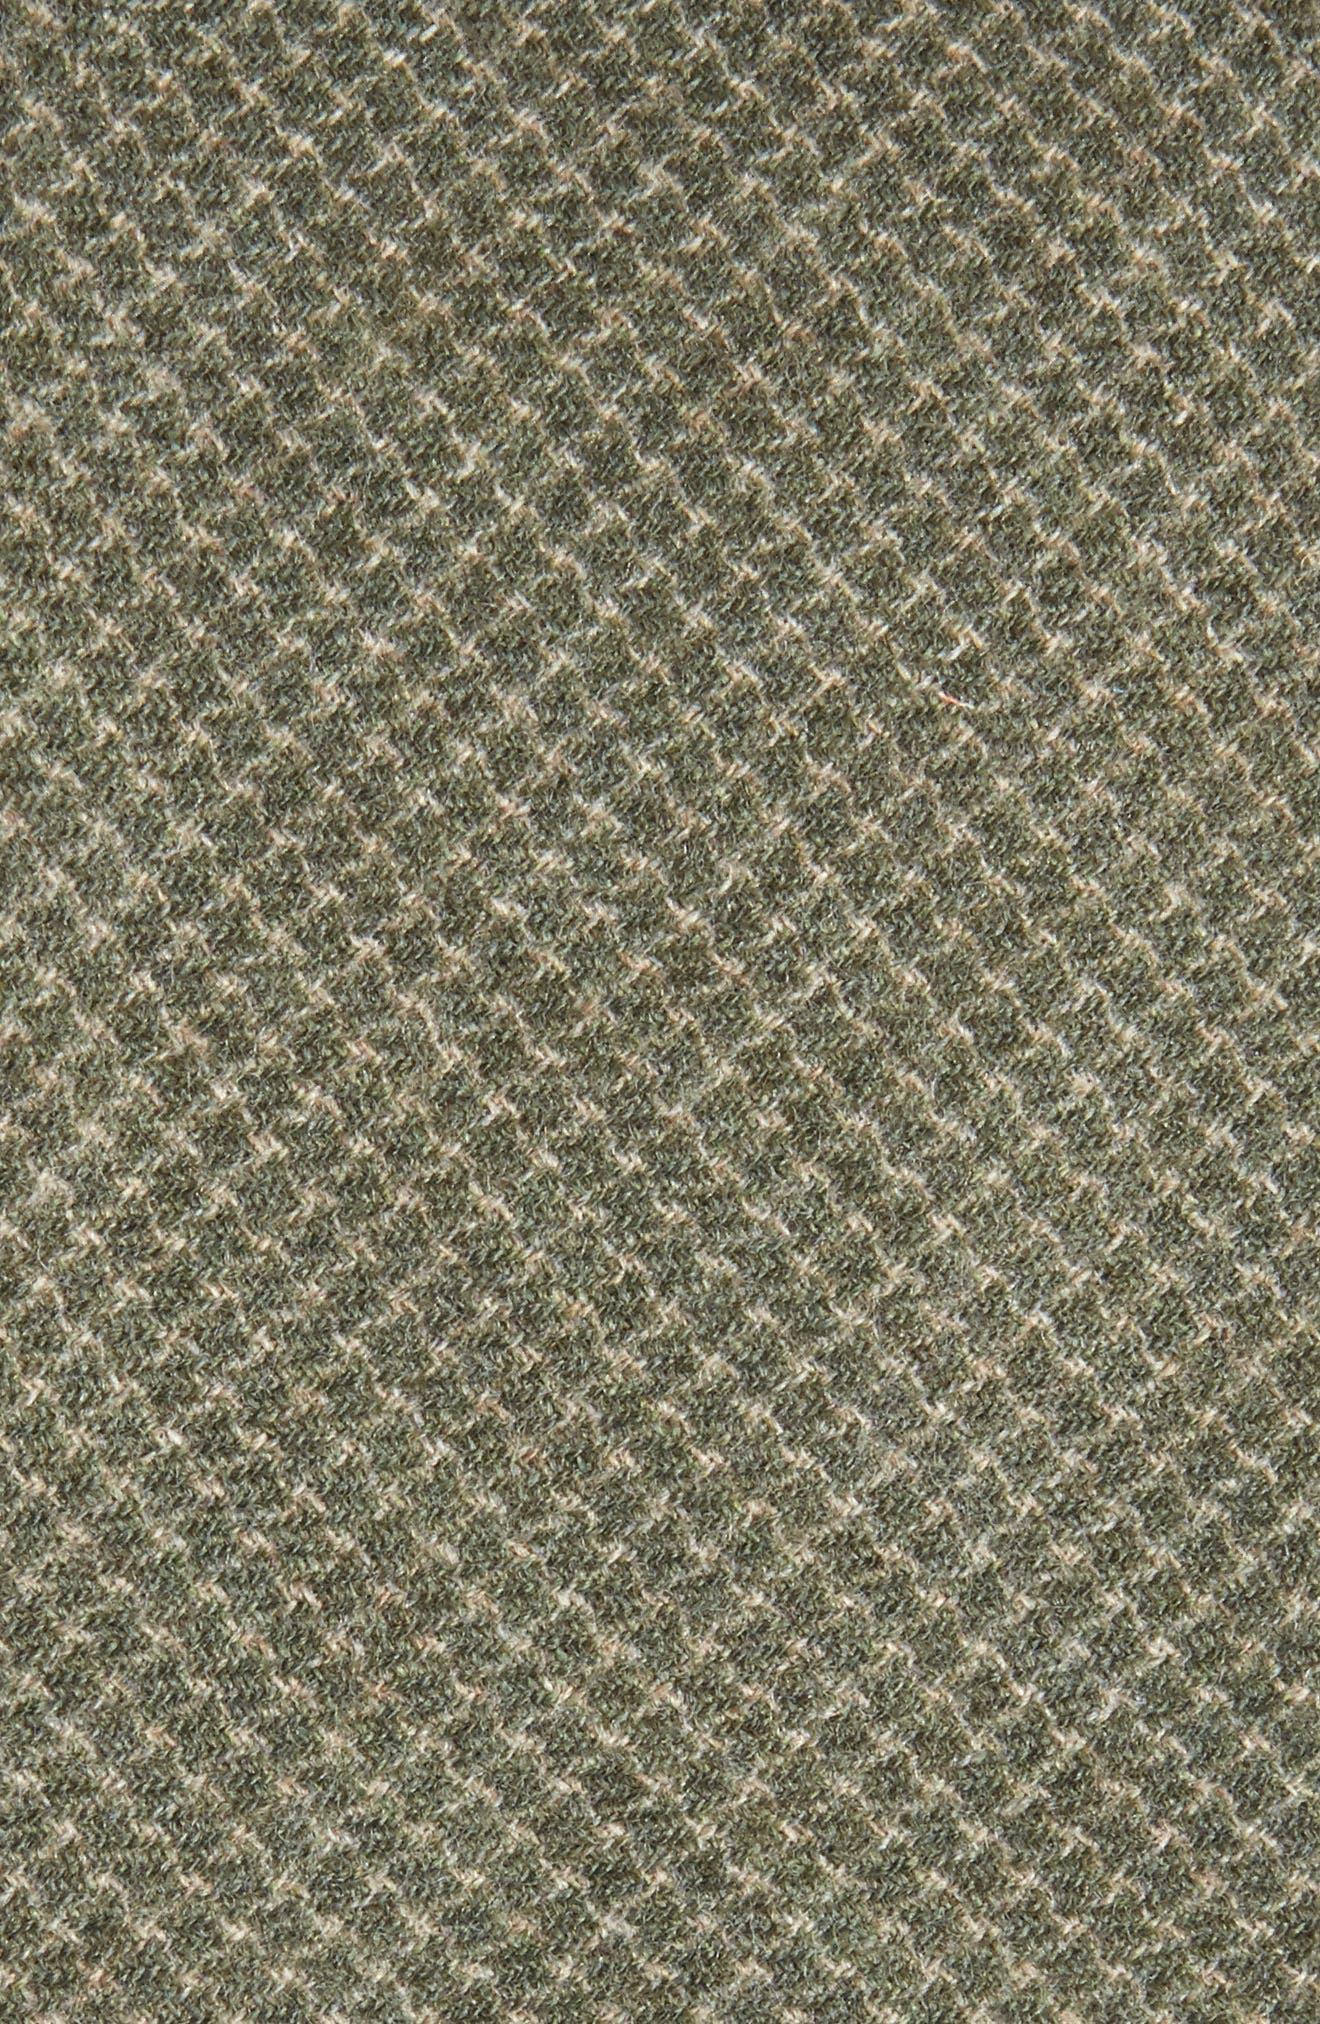 Geometric Wool Tie,                             Alternate thumbnail 5, color,